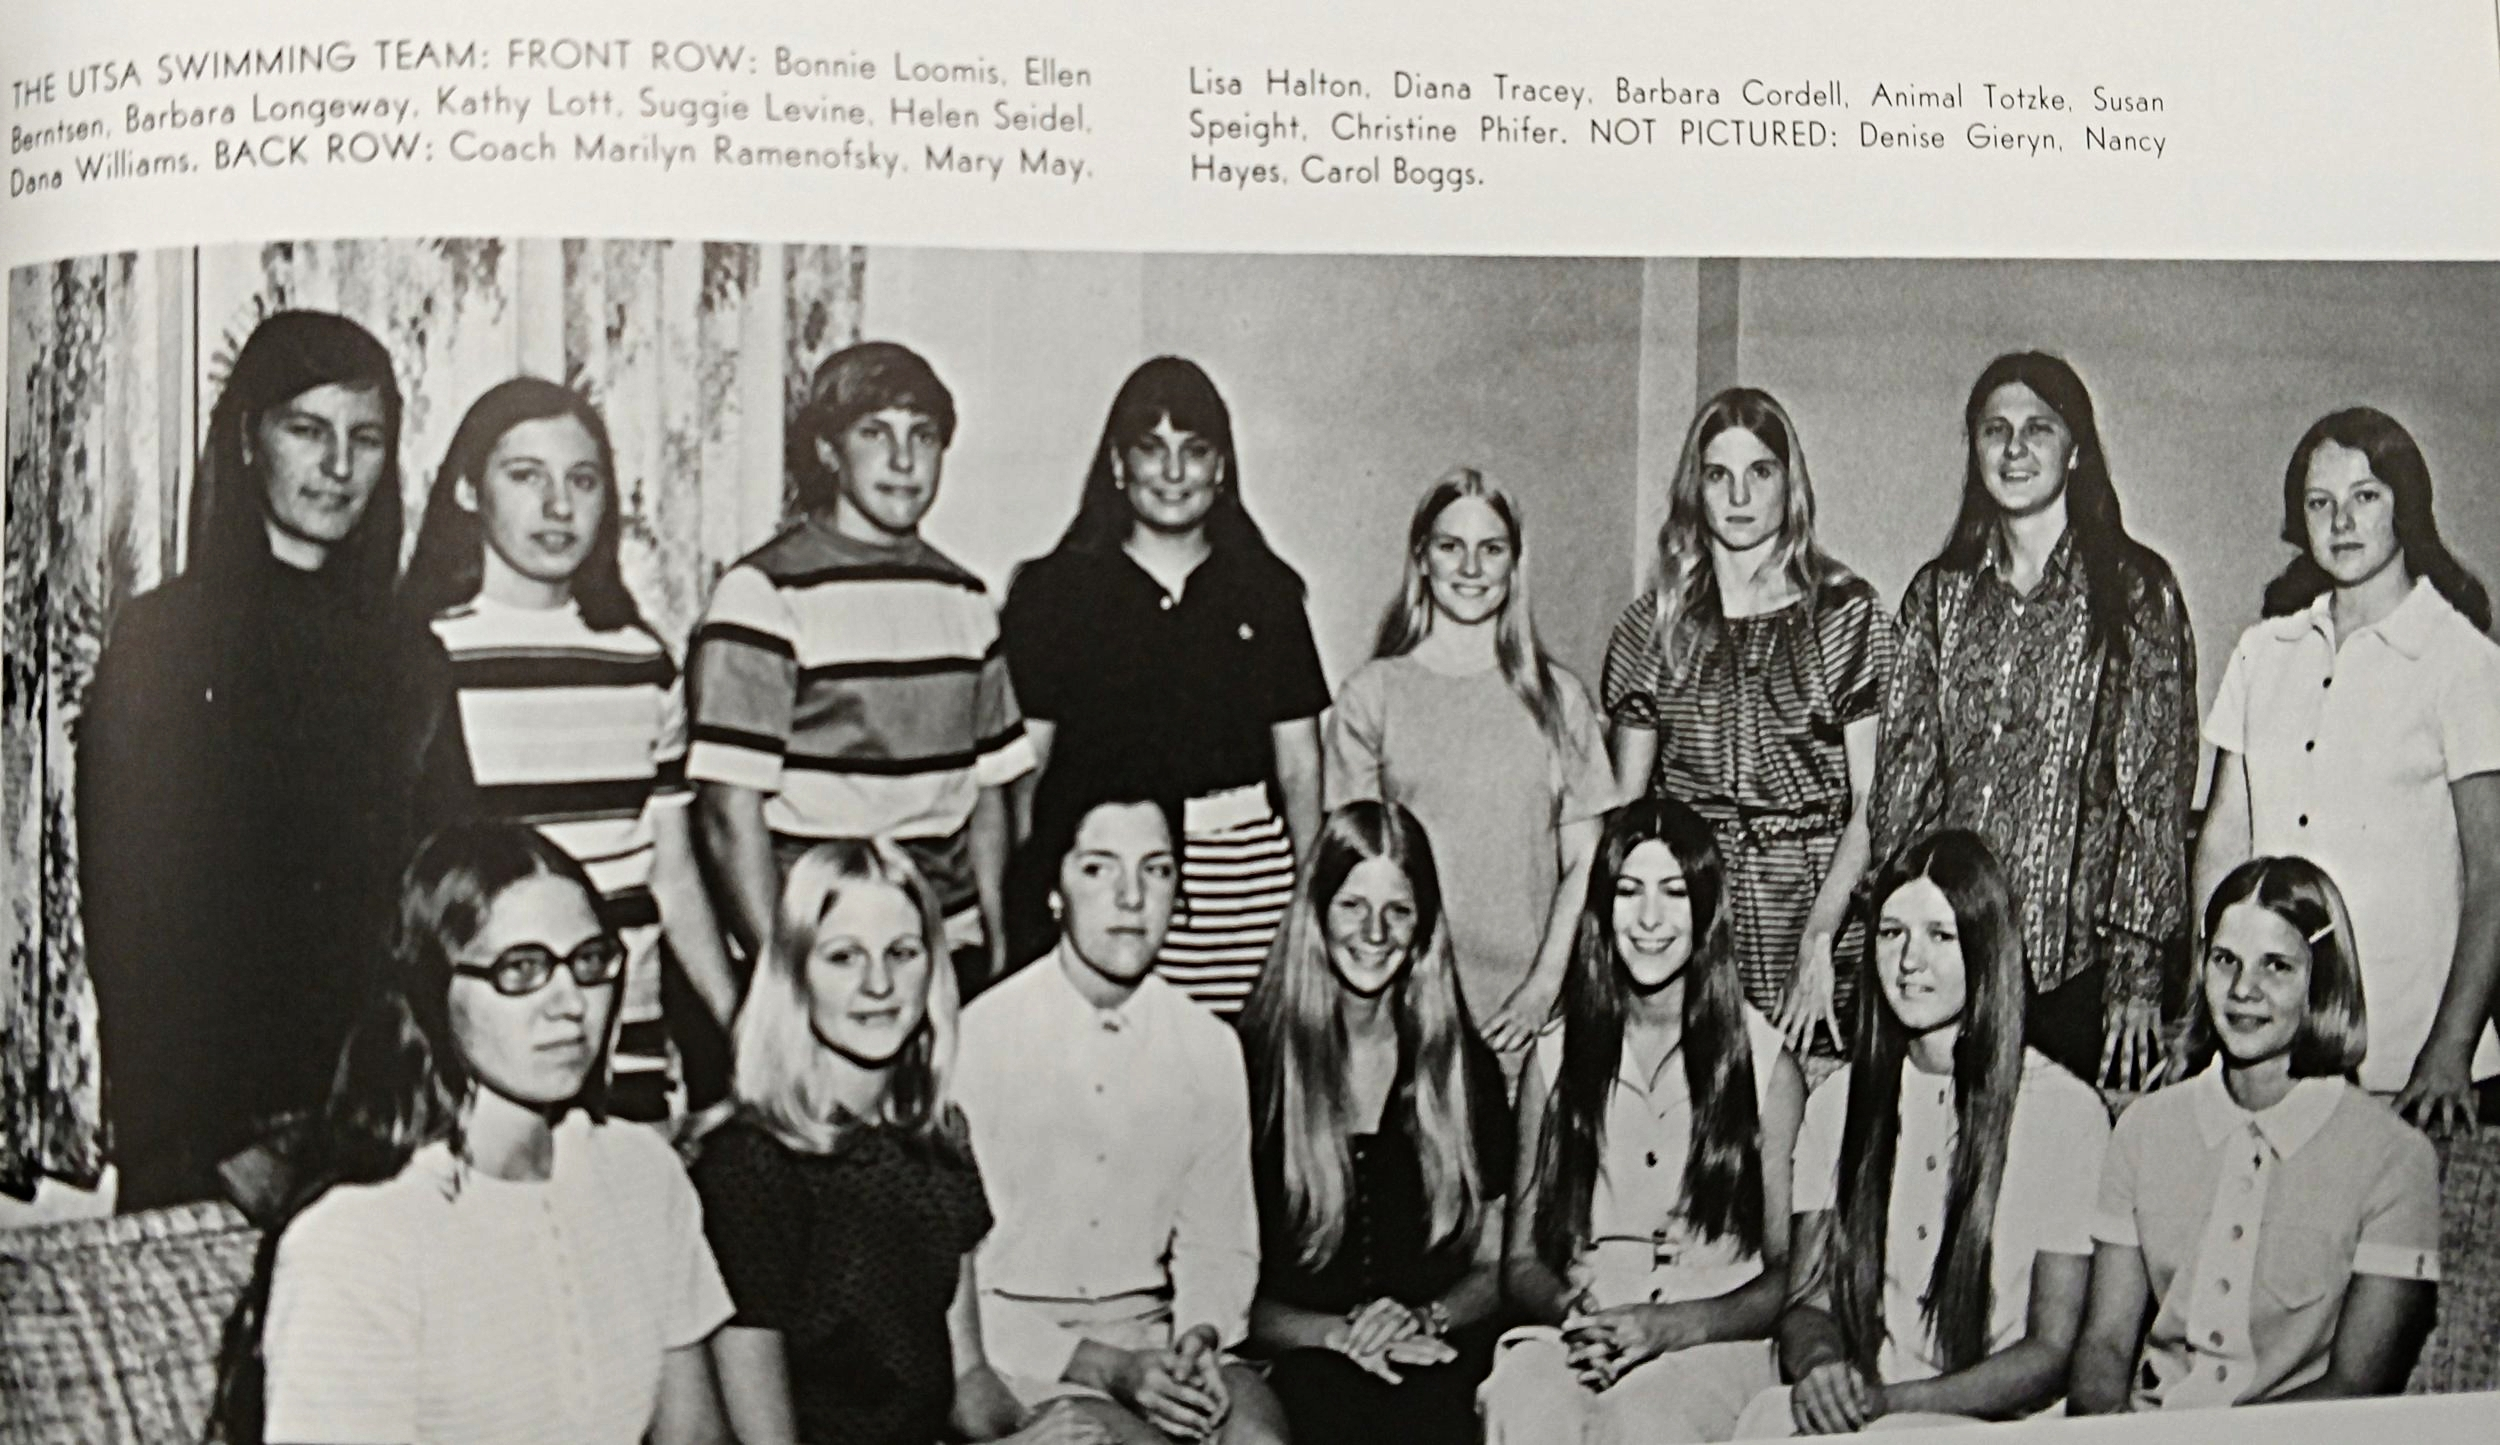 1971 swim team Coach Marilyn Ramenofsky